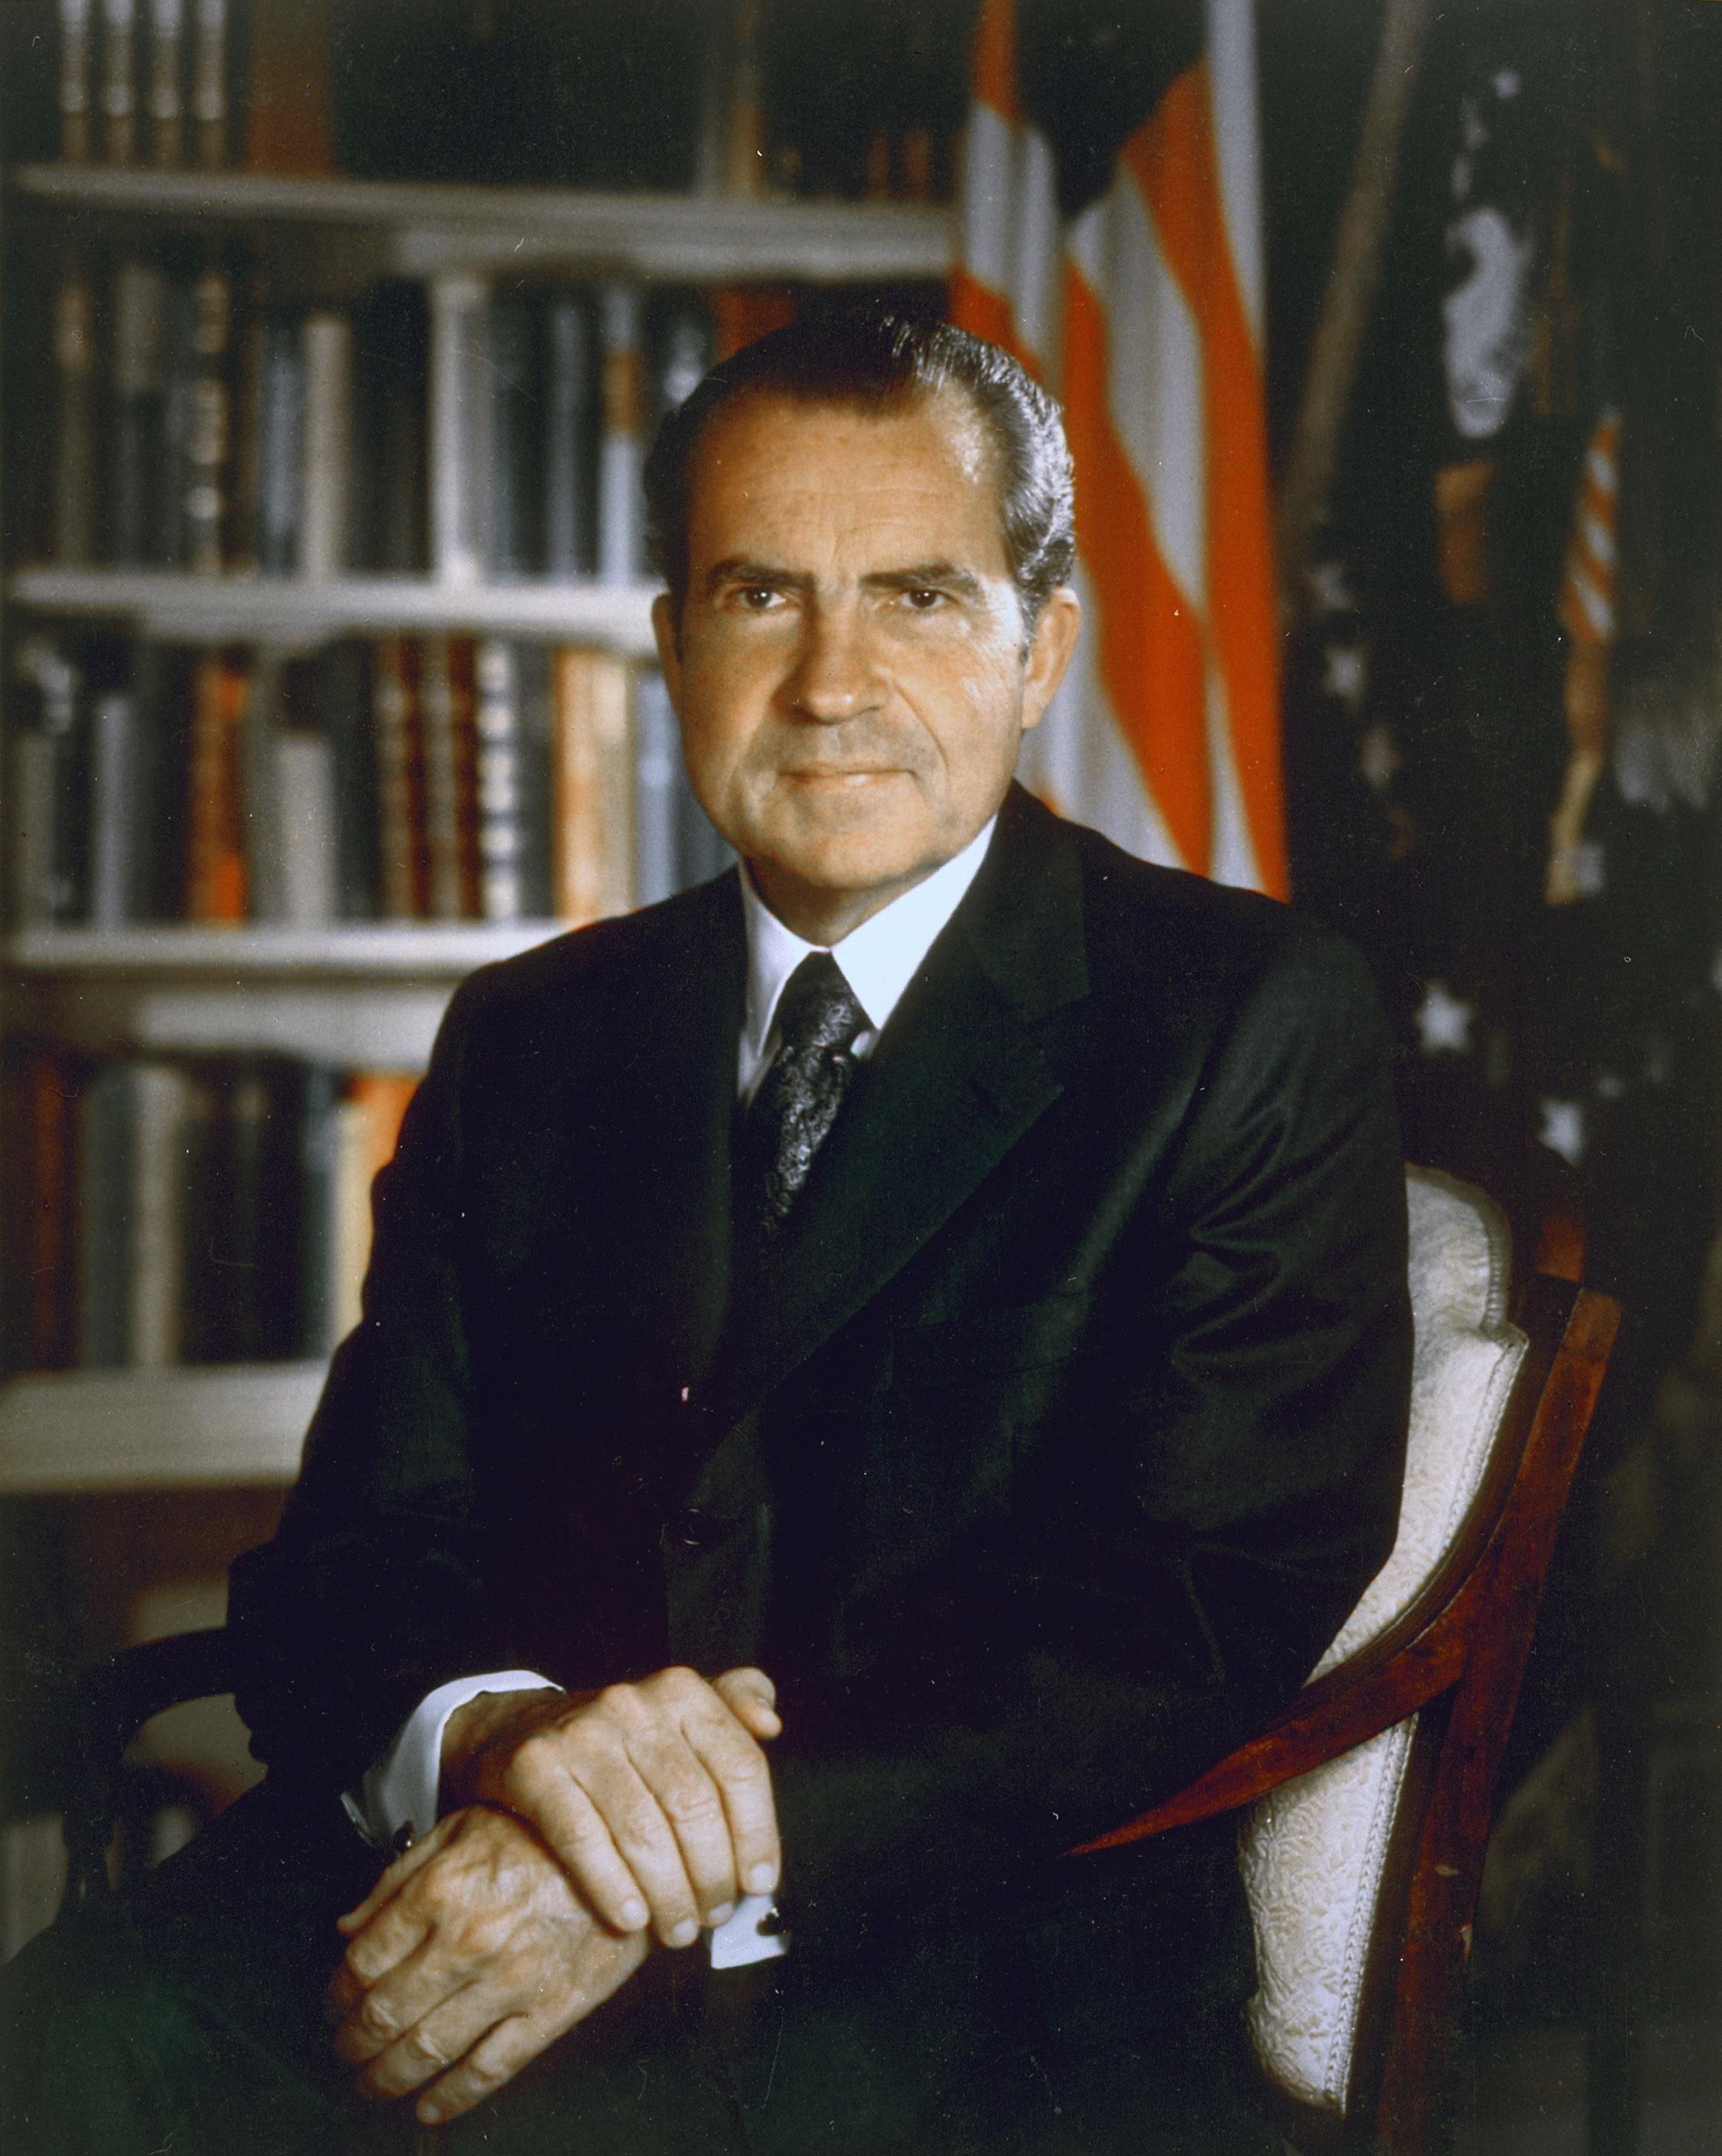 Depiction of Richard Nixon